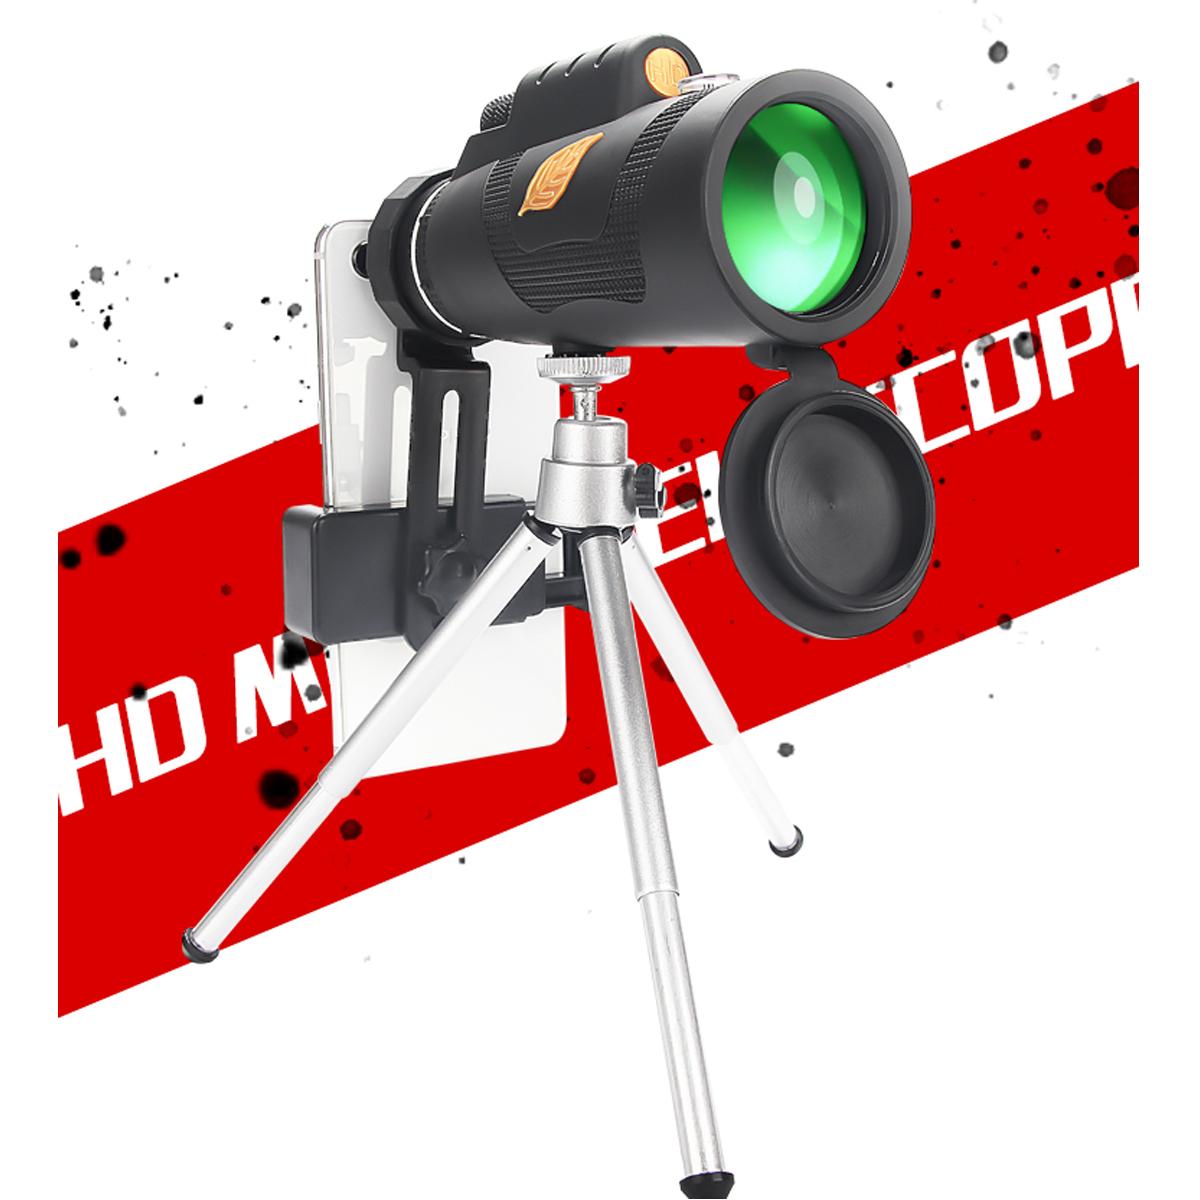 12X50 Phone Telescope Portable Outdoors Telescope Phone Lens Light Phone Telescope with Tripods Phone Clip